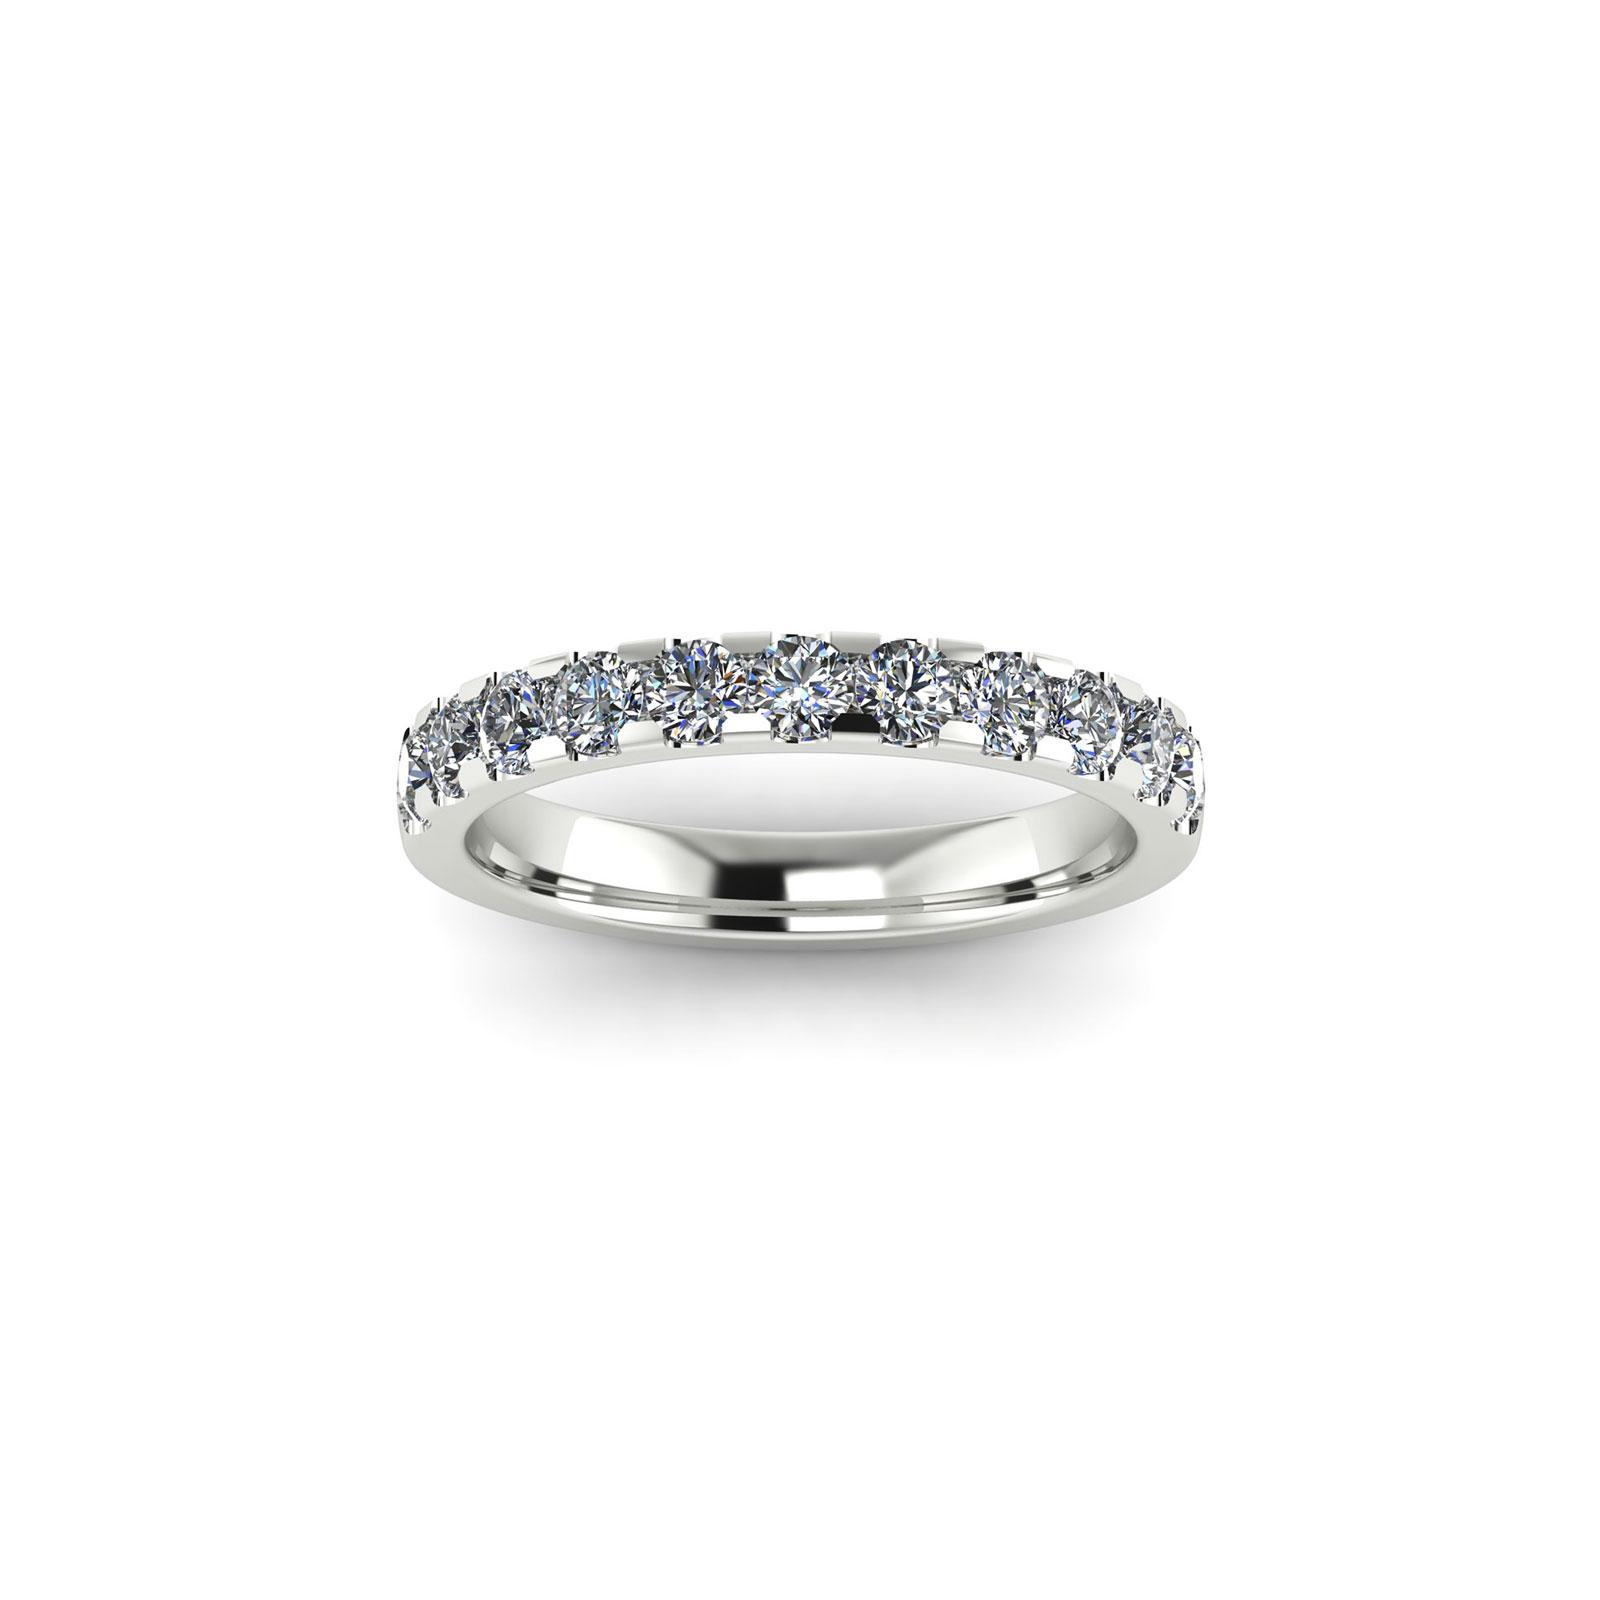 Half Eternity Wedding Band 2.7mm (Top View) - Draco Diamonds